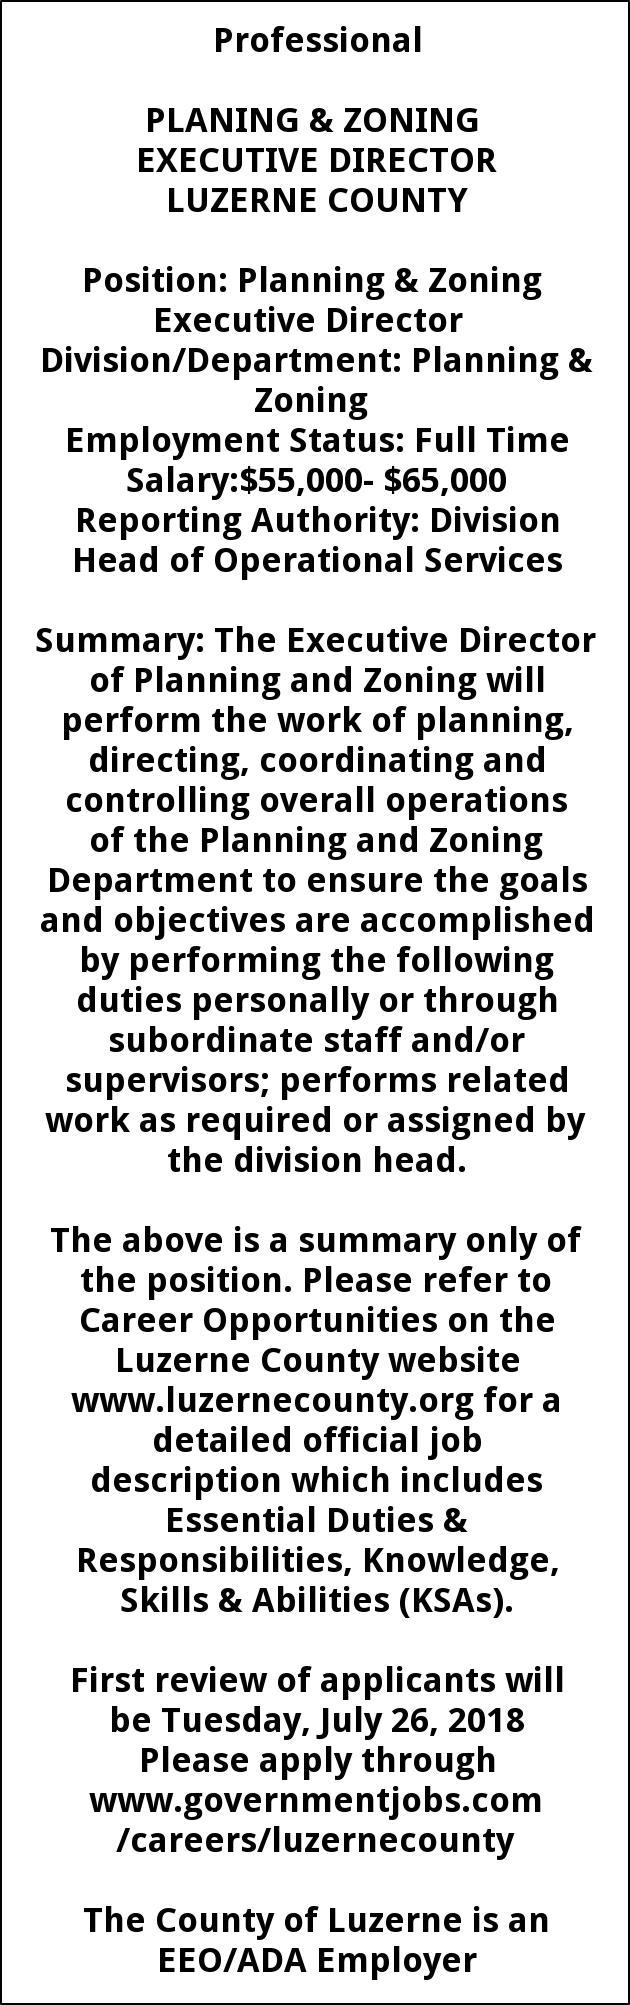 Executive Director Job Description | Planning Zoning Exec Director Luzerne County